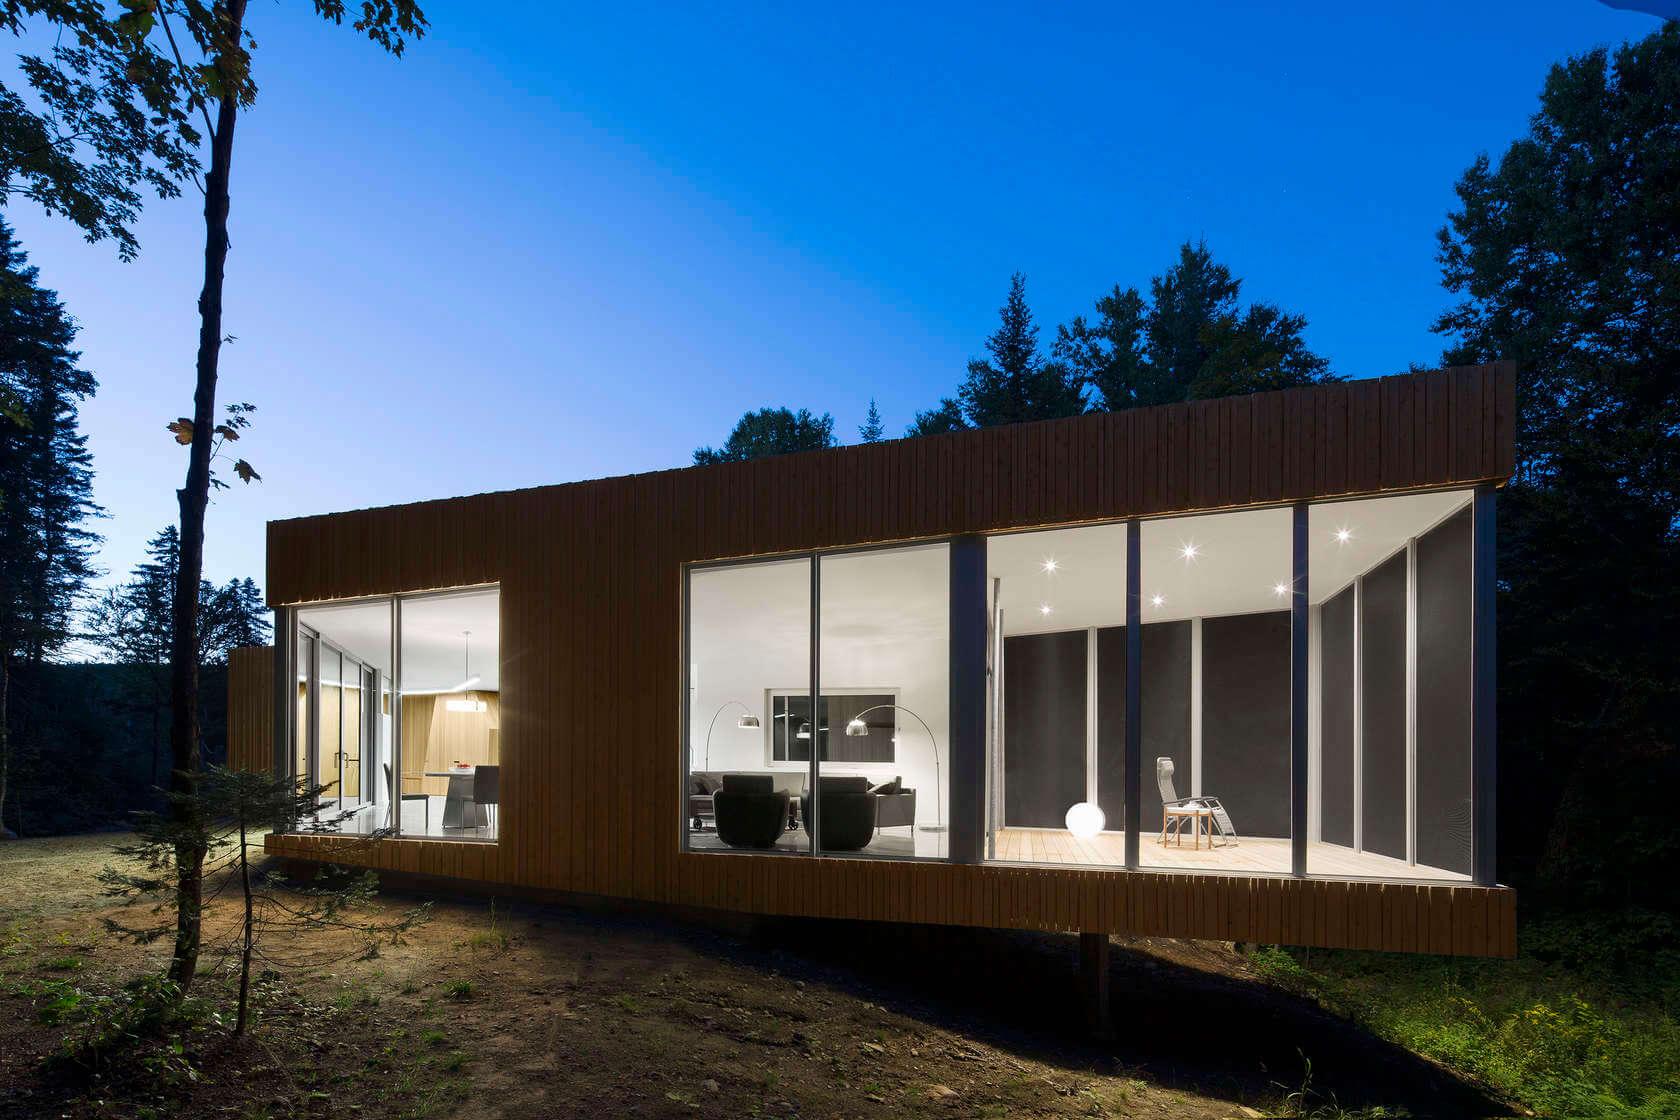 architecture_house_apartment_design_studia_interiors_osnovadesign_osnova_poltava_07